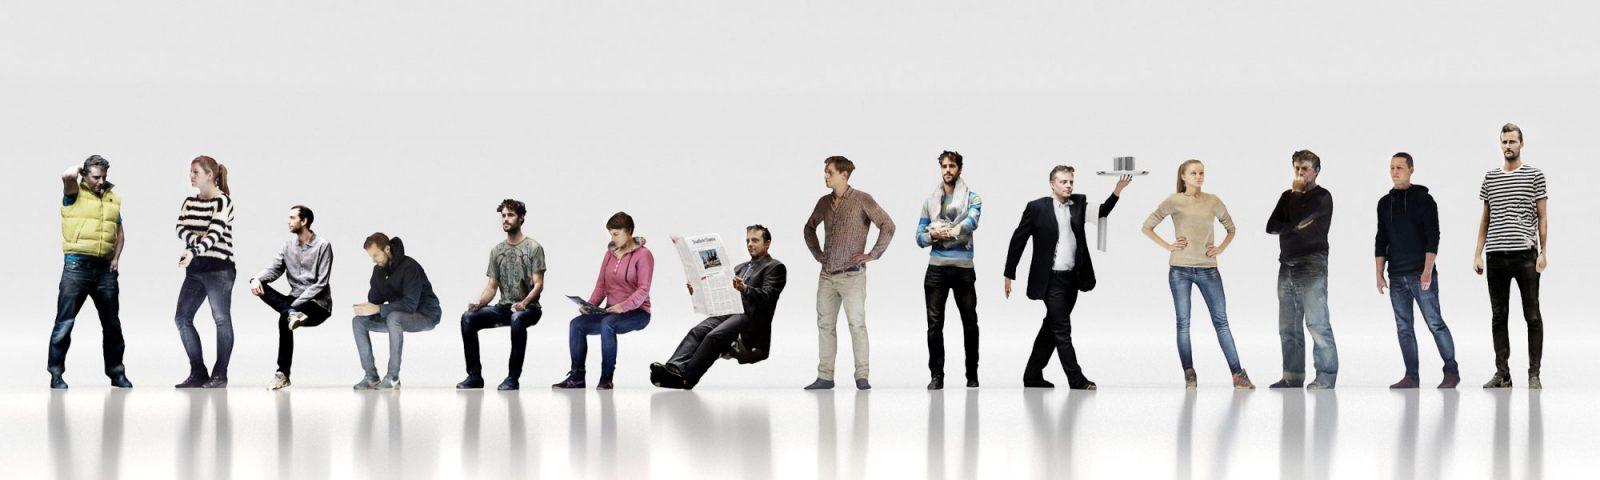 Xoio Air 3d Scanned People Improved Version Xoio Air